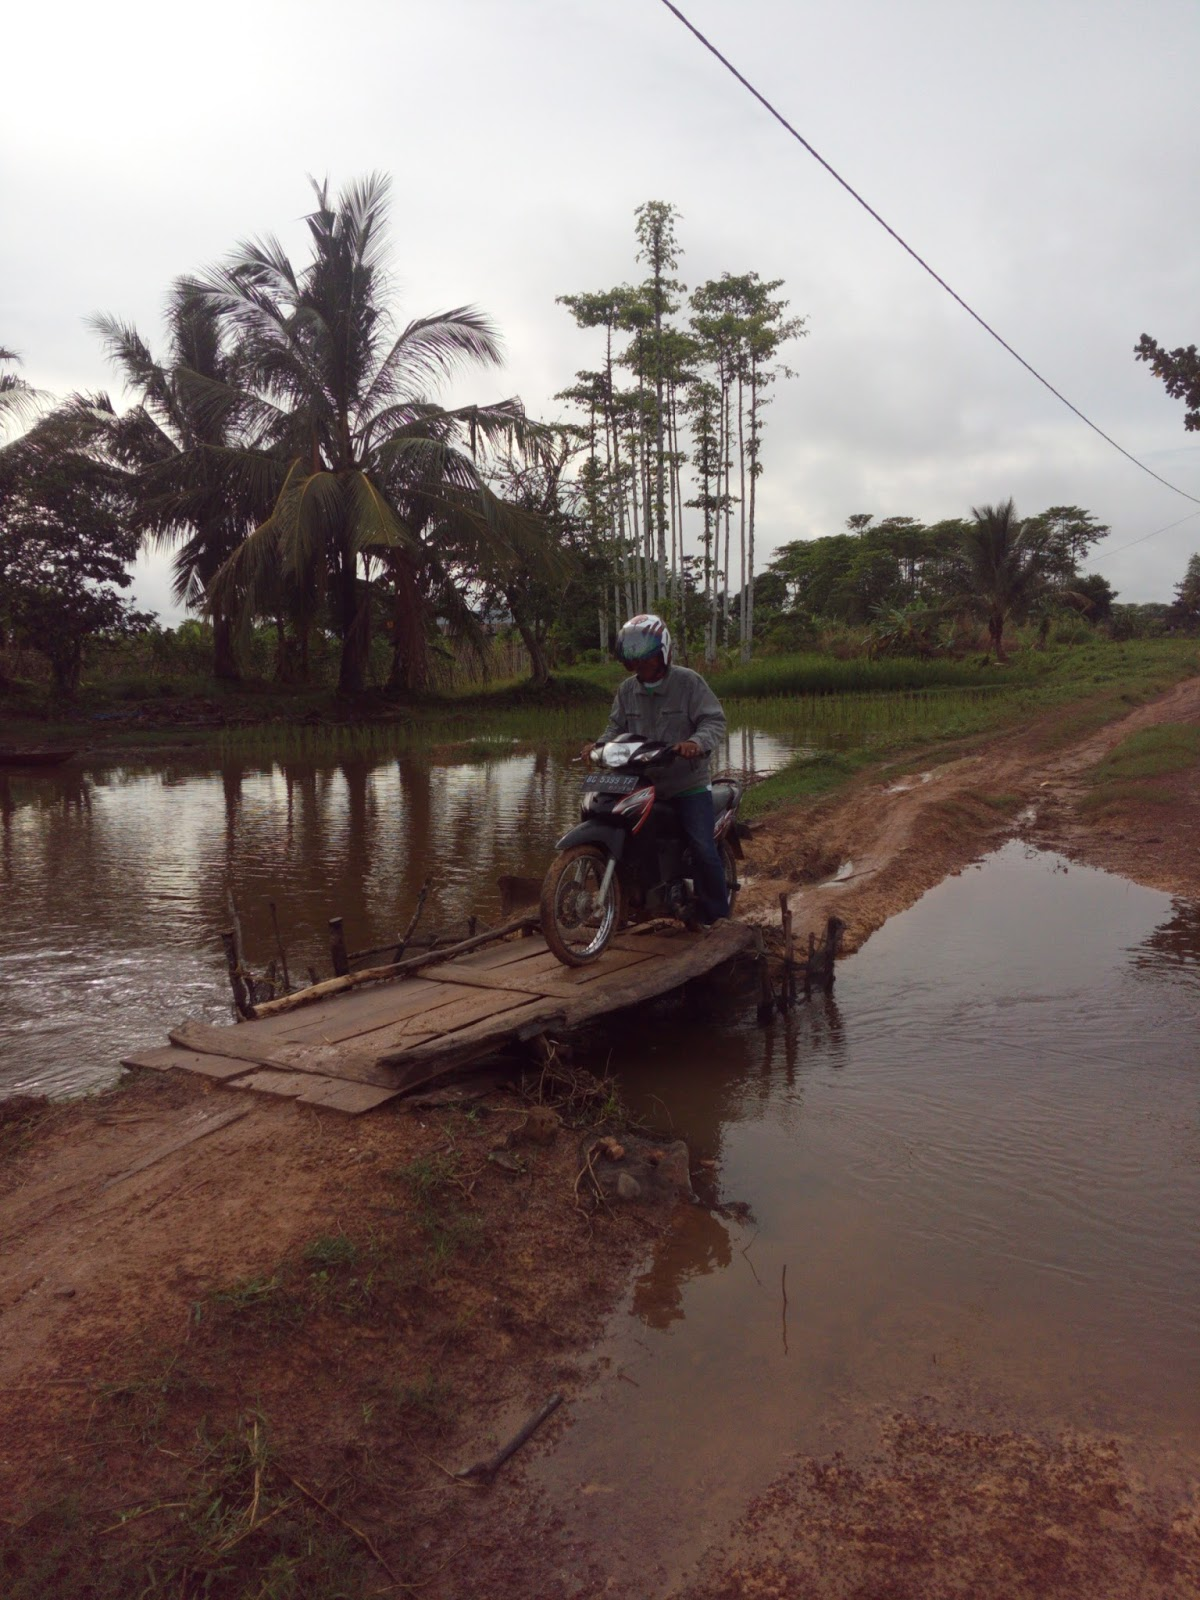 Jalan Dan Jembatan Kecamatan Rantau Panjang Rusak Krsumselcom